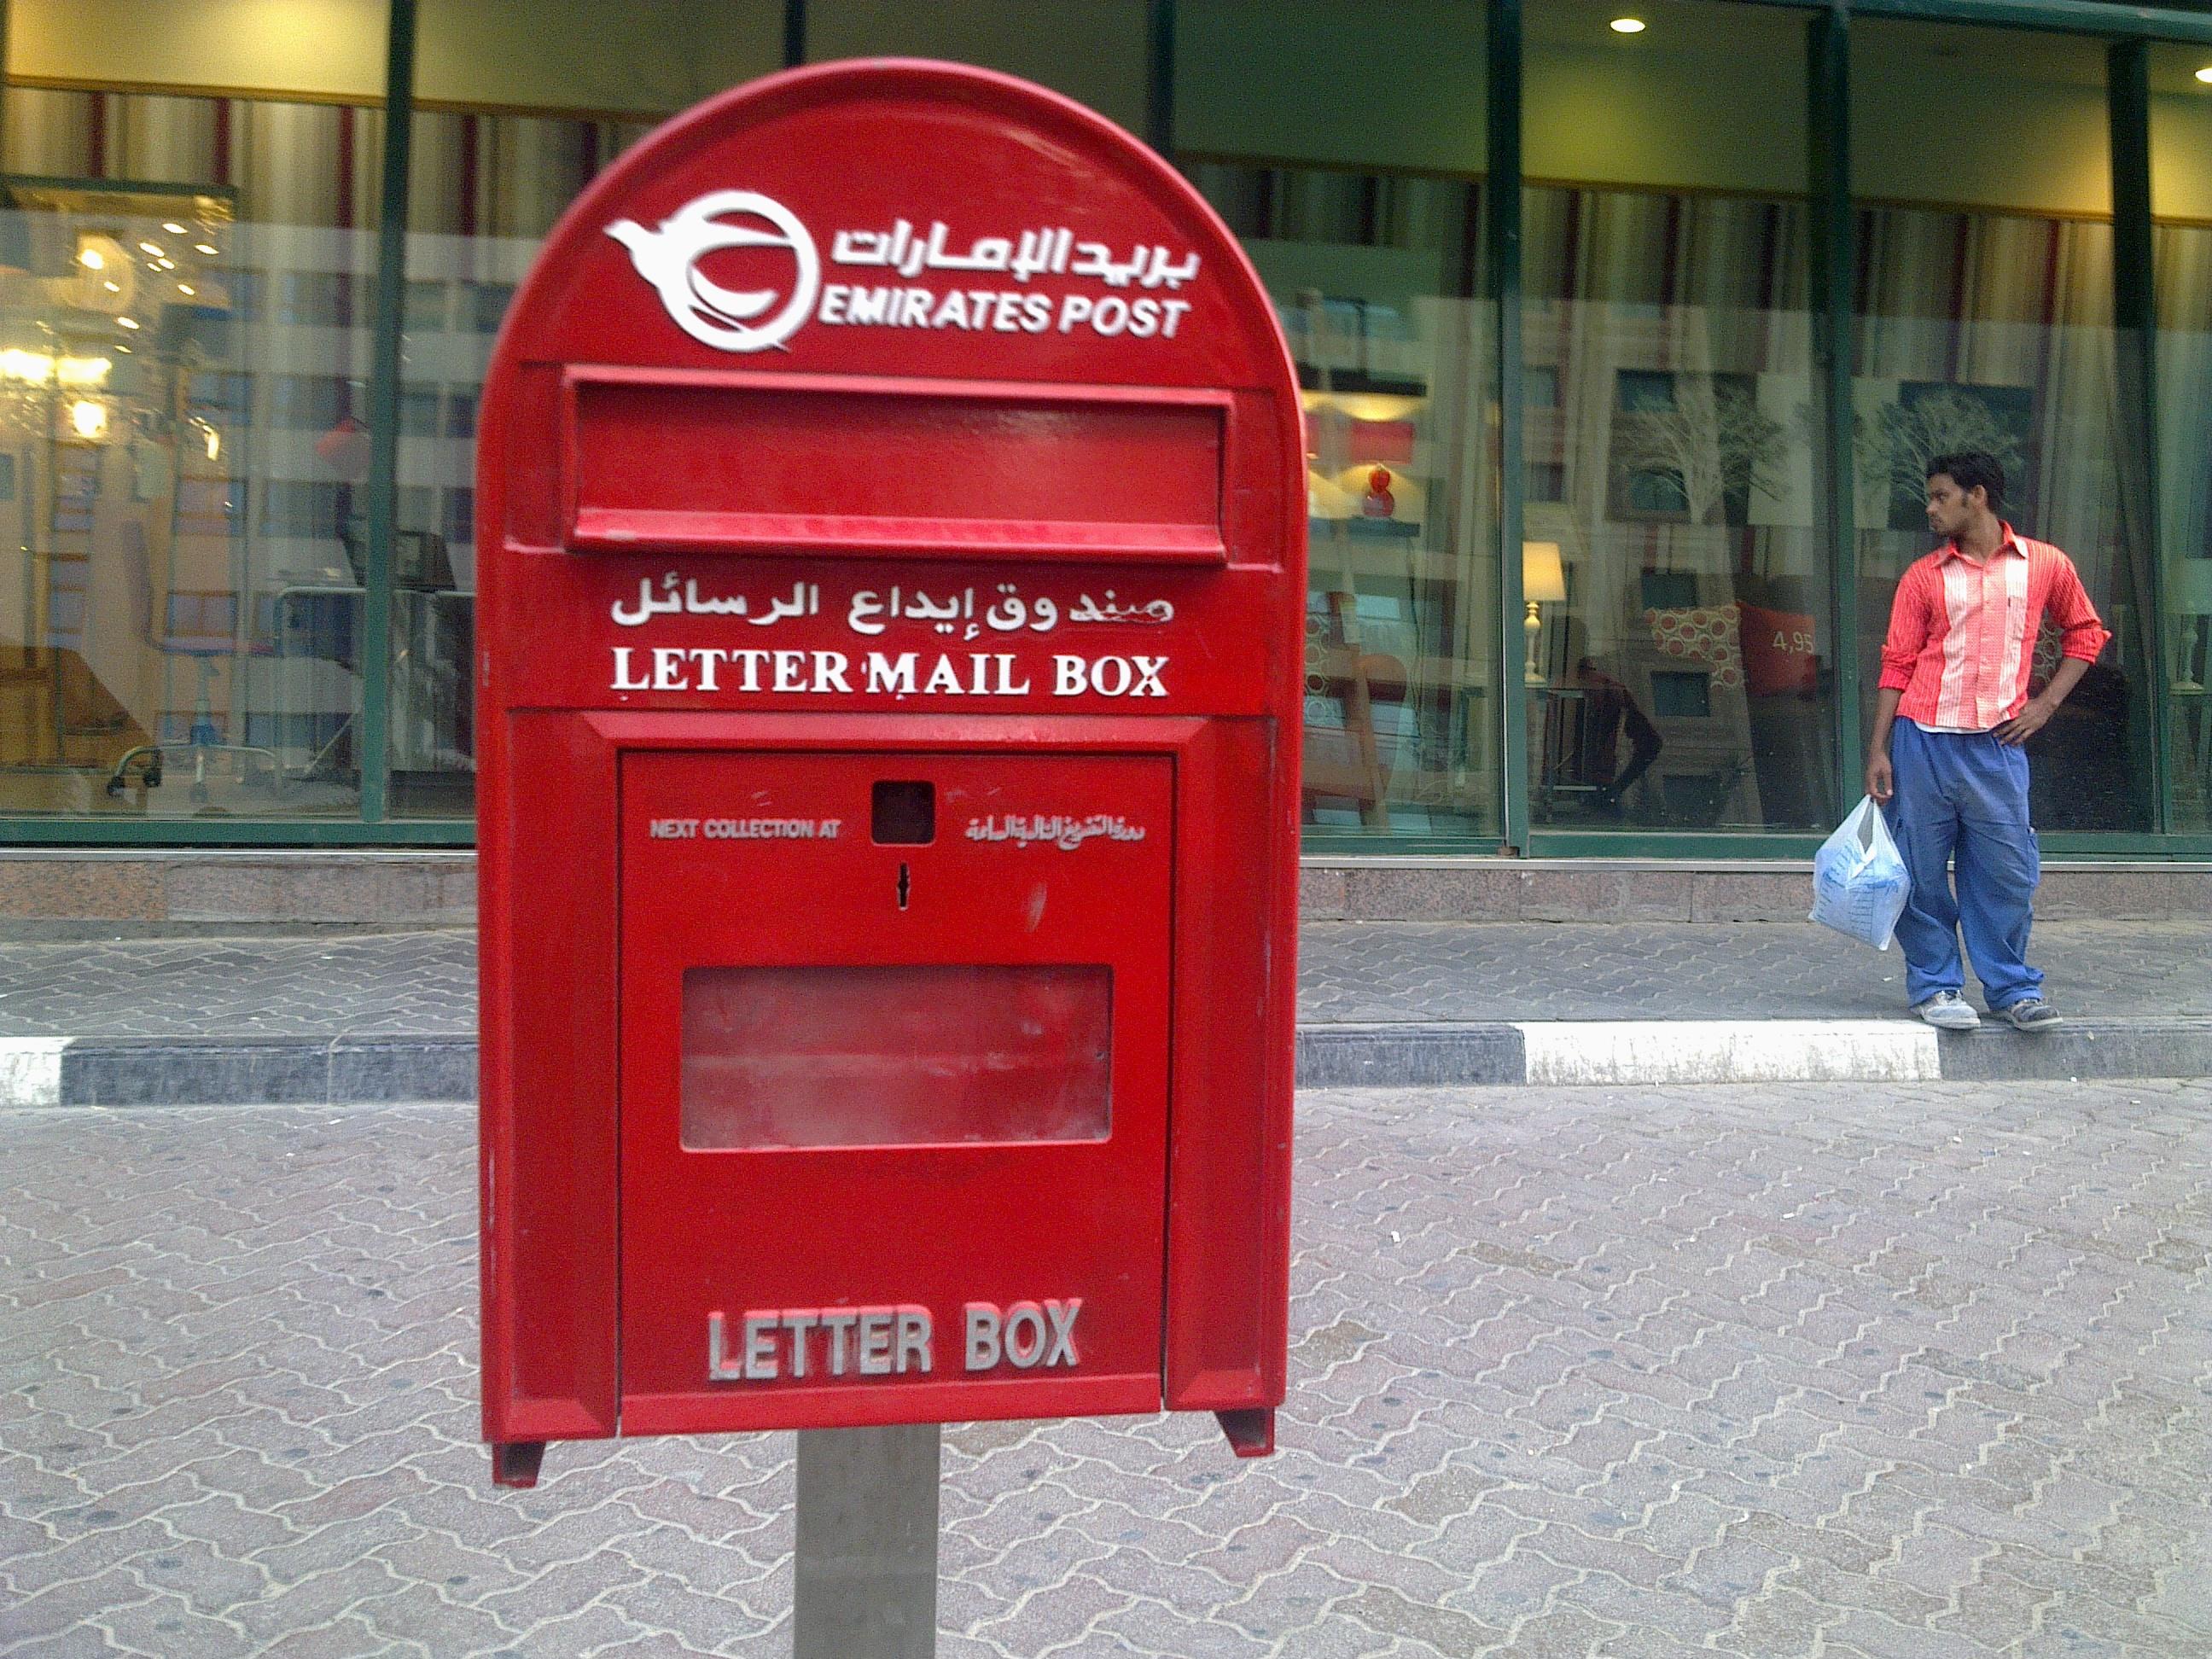 FileLetter Mail Box Abu DhabiJpg  Wikimedia Commons